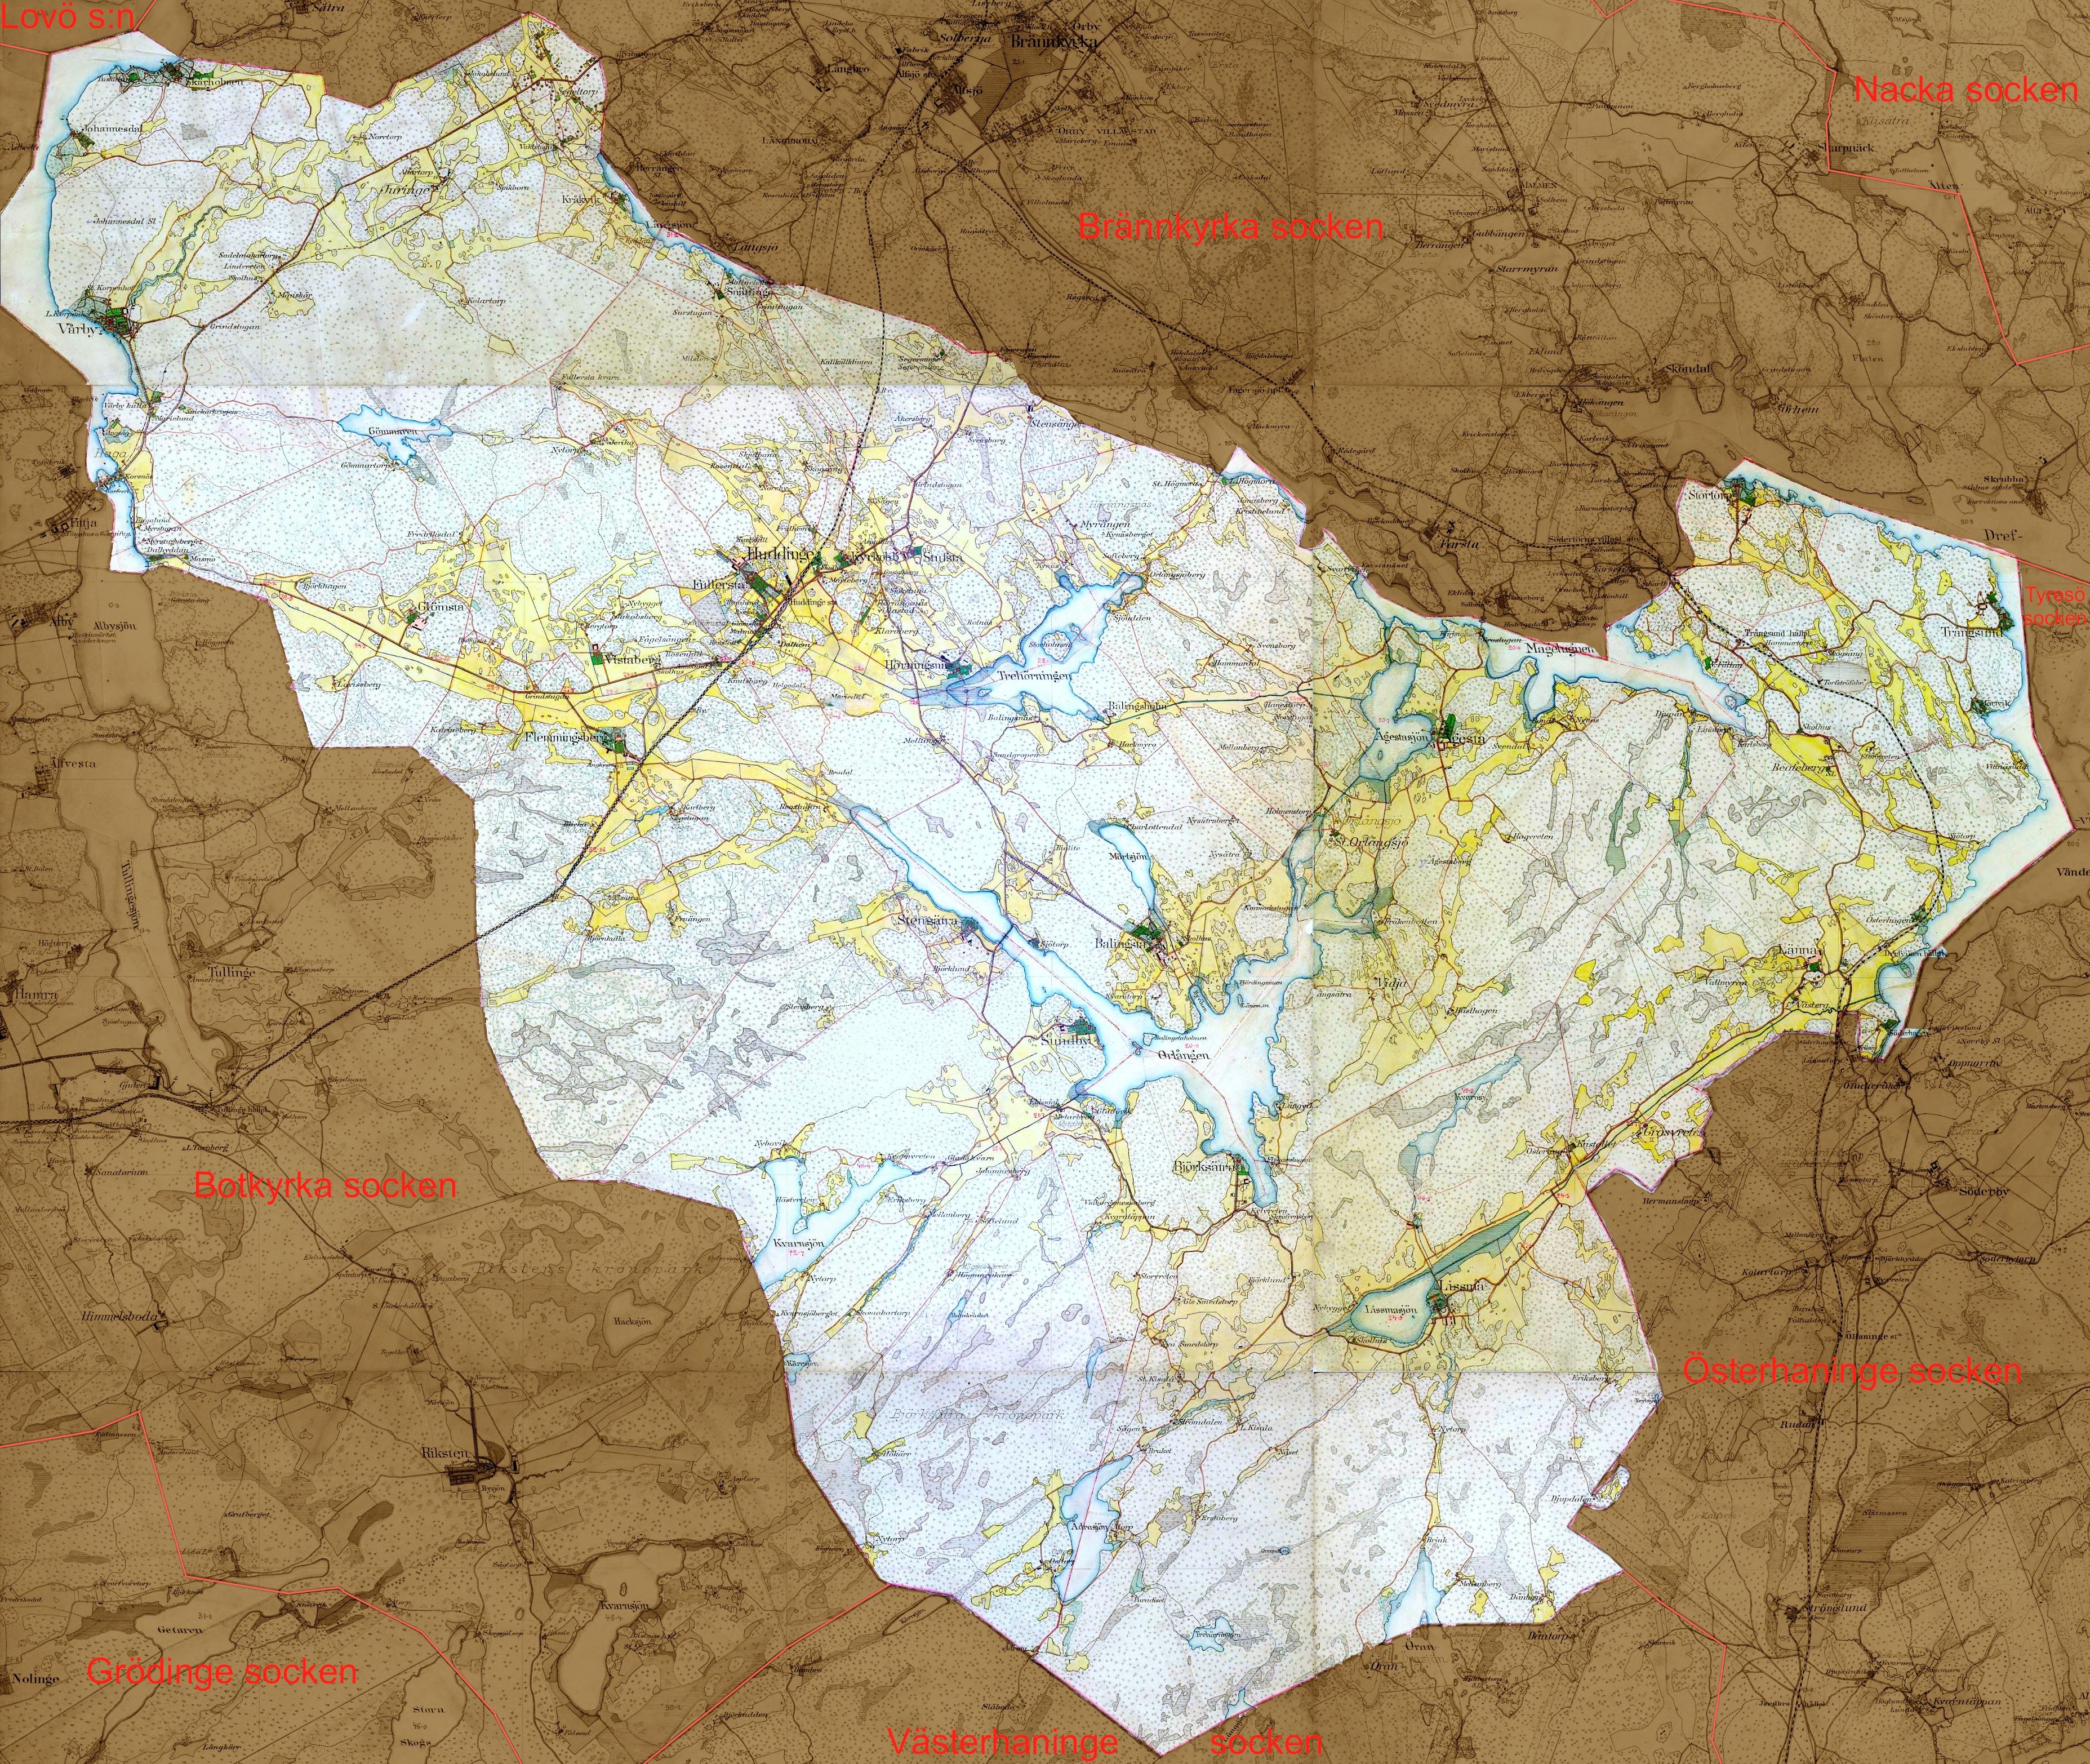 huddinge karta File:Huddinge sockenkarta1901 1906.   Wikimedia Commons huddinge karta